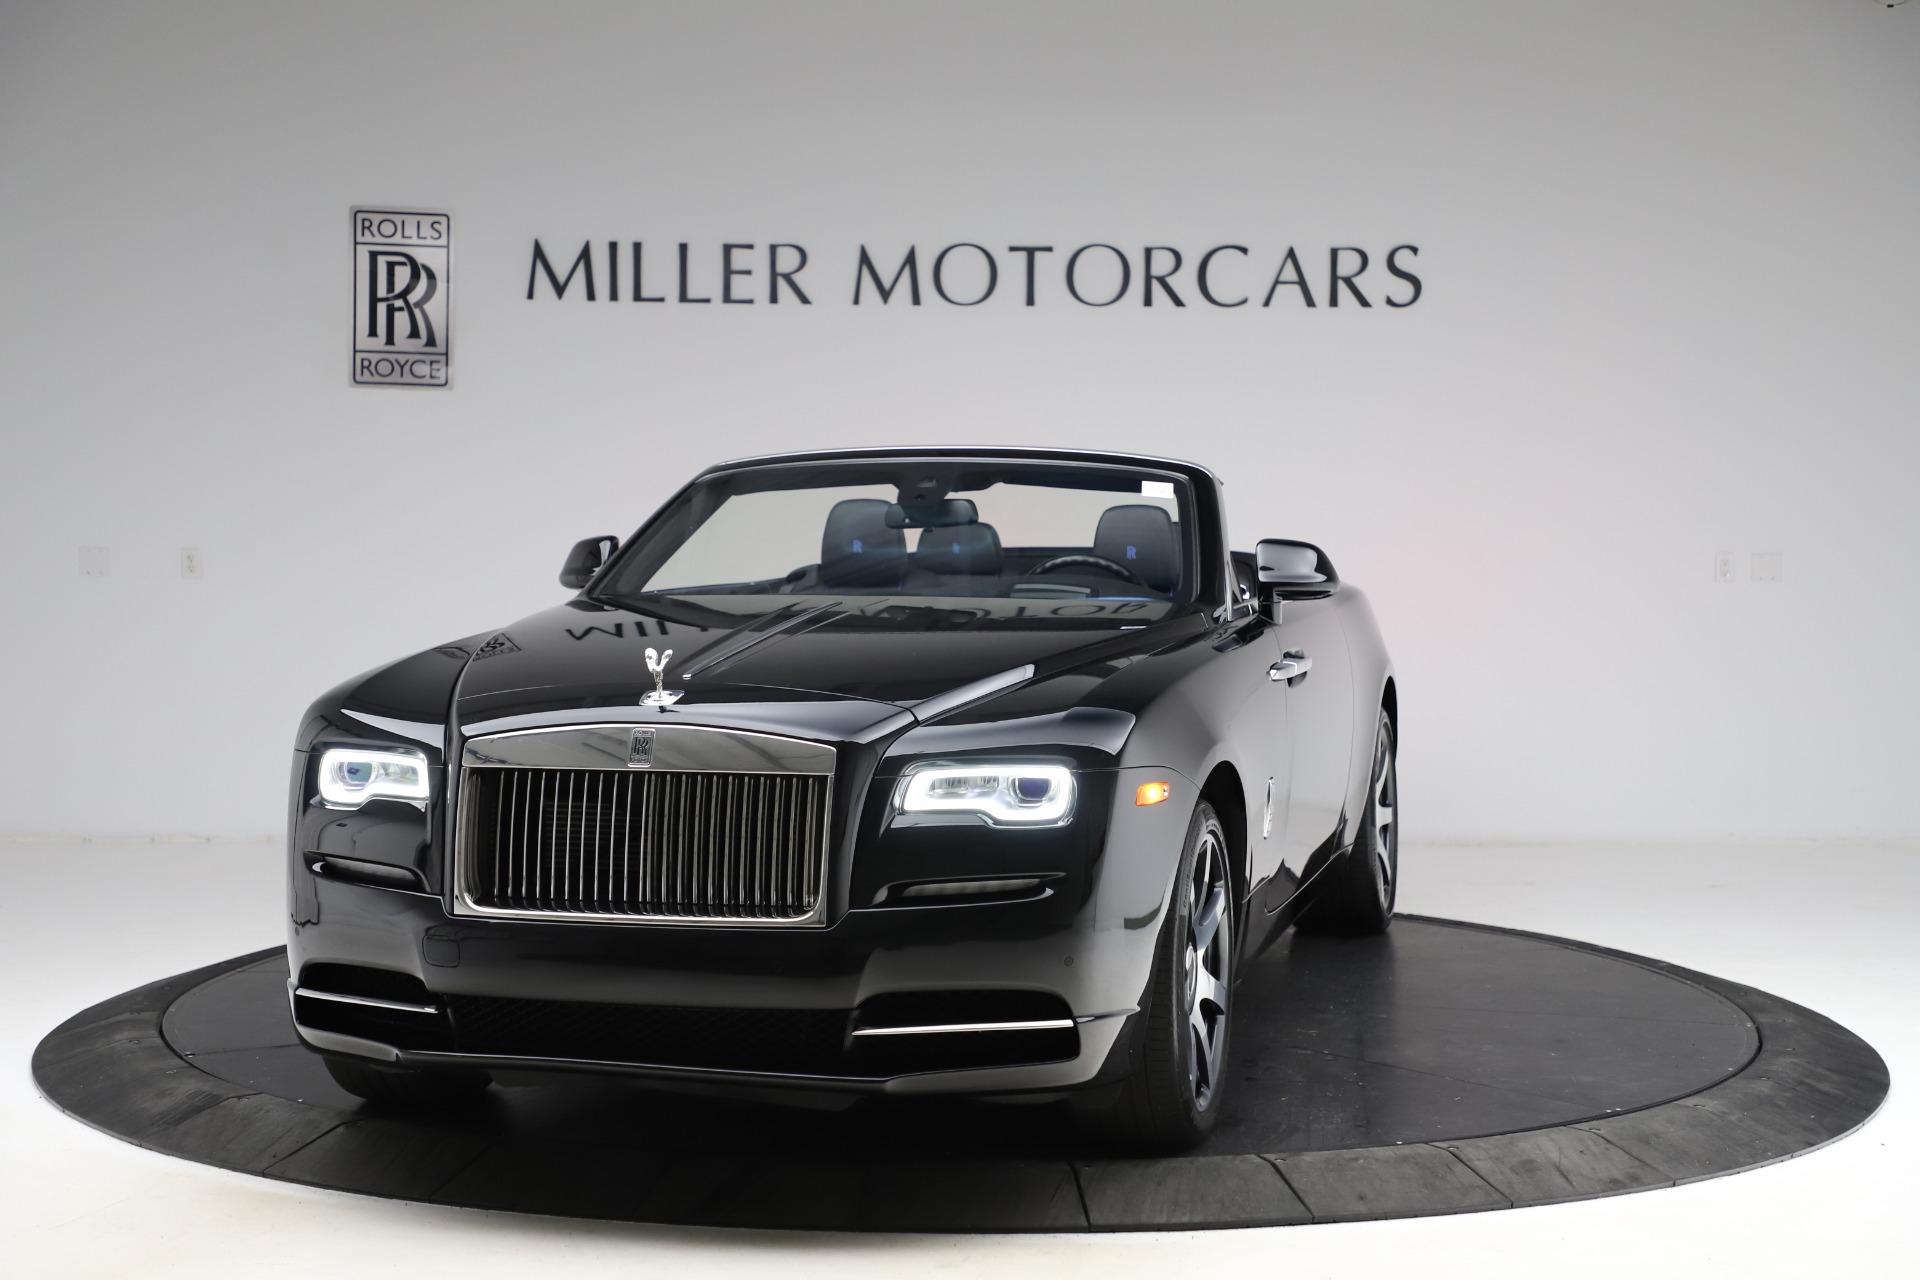 New 2017 Rolls-Royce Dawn for sale Sold at Bugatti of Greenwich in Greenwich CT 06830 1